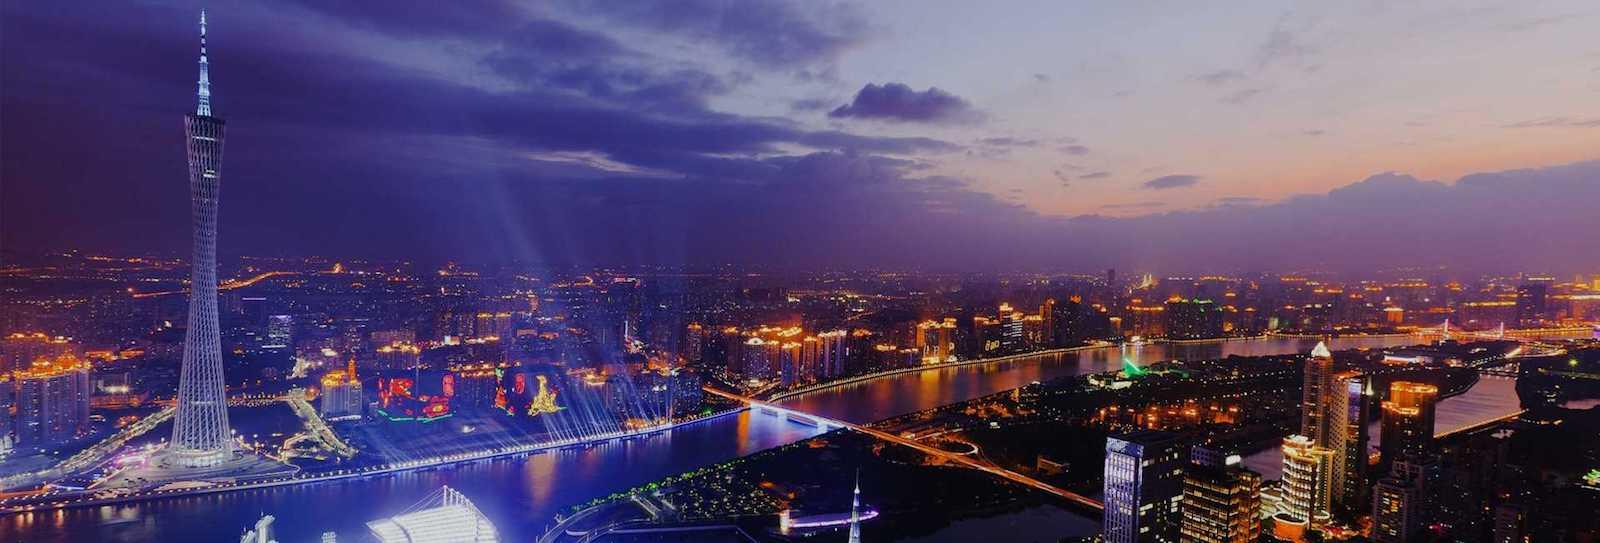 Гуанчжоу — город контрастов